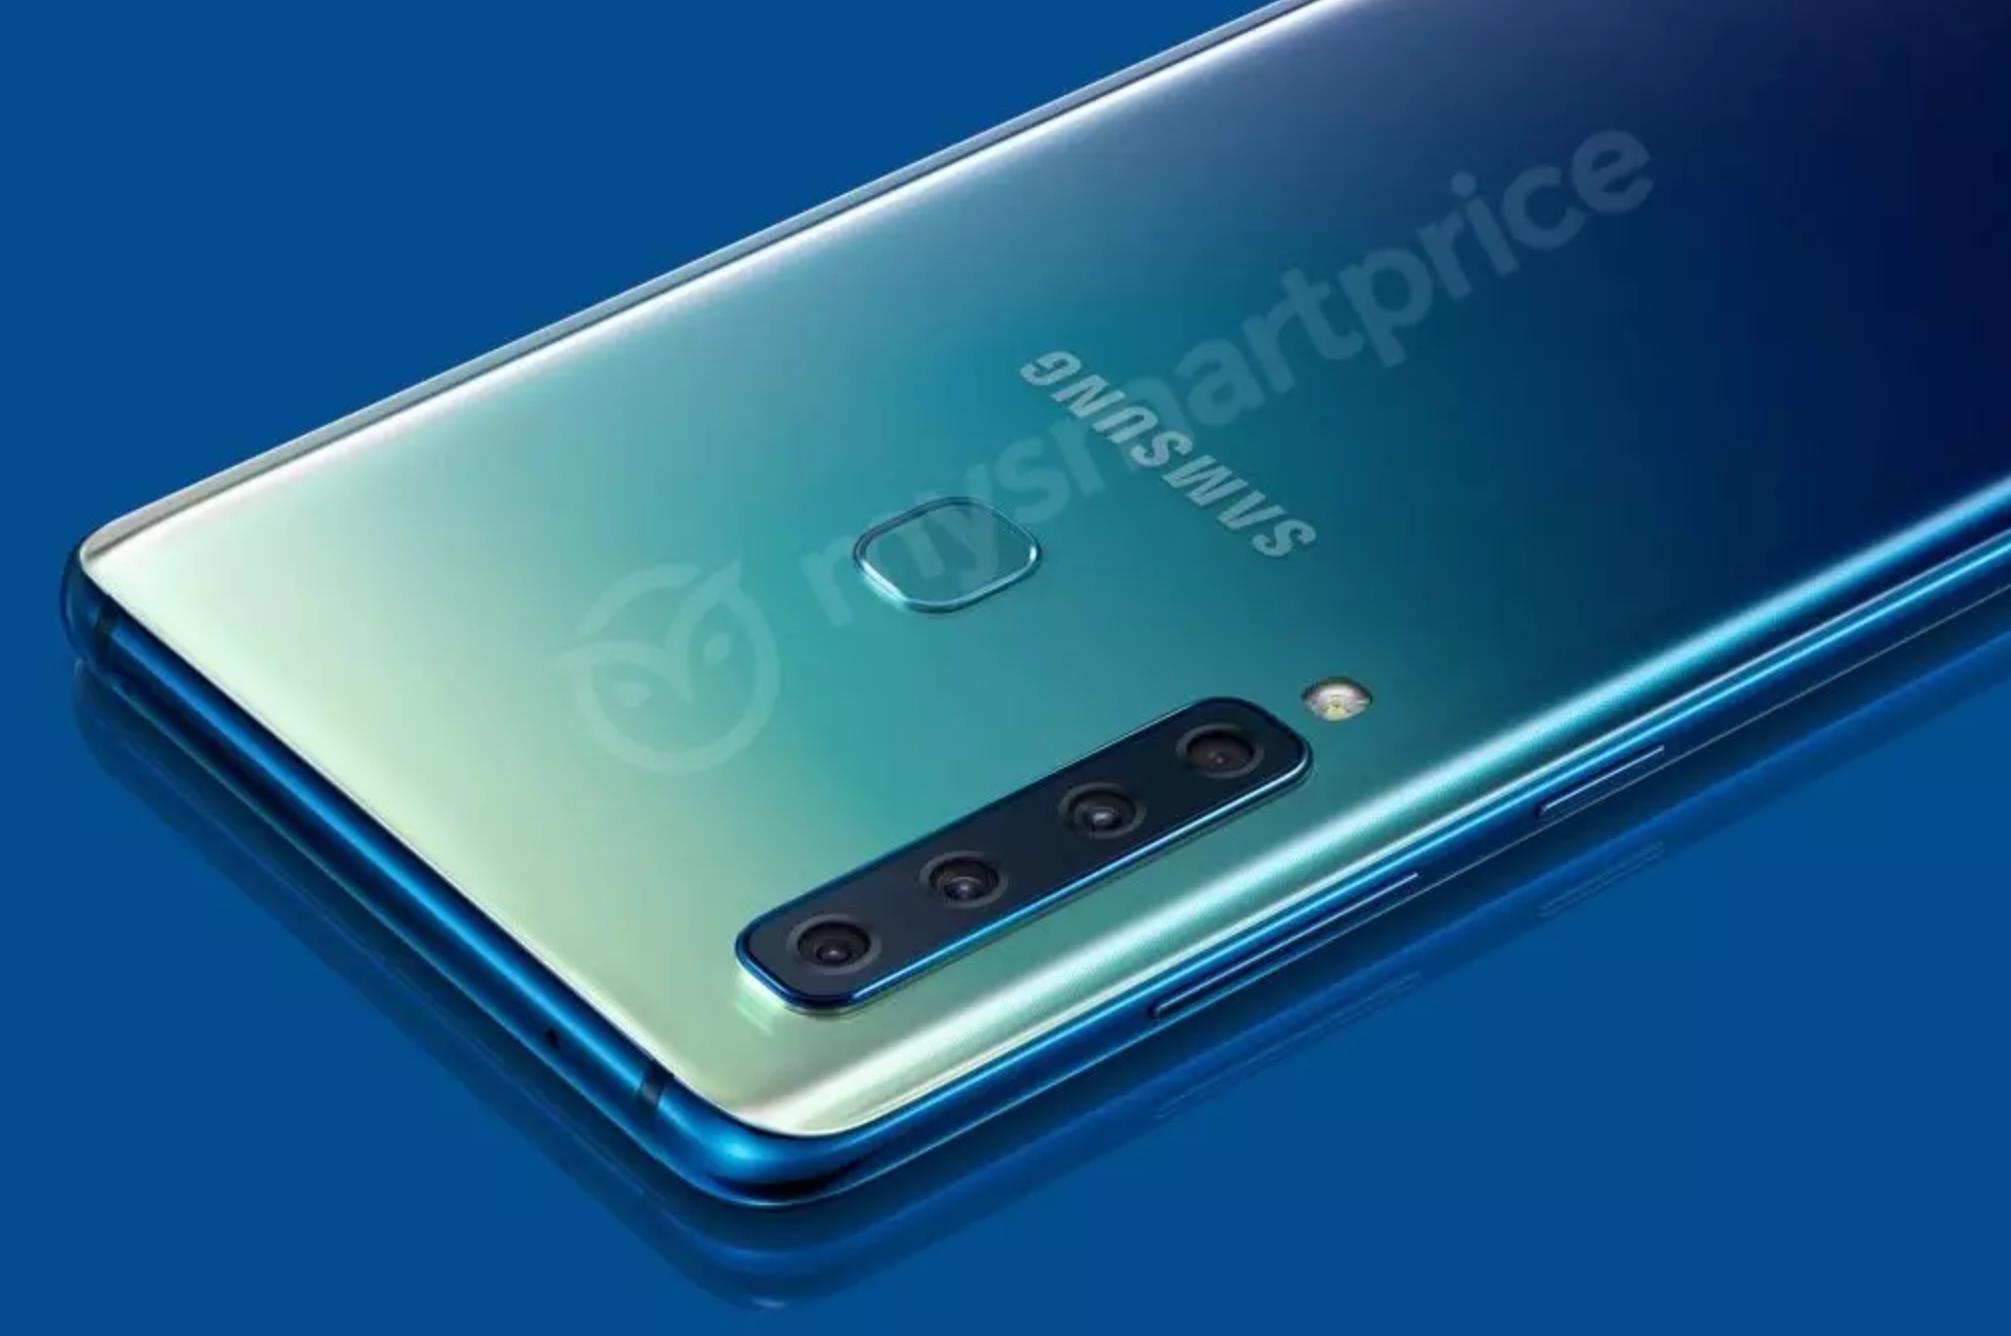 Sjekk ut Samsungs spinnville nye Galaxy med fire kameraer